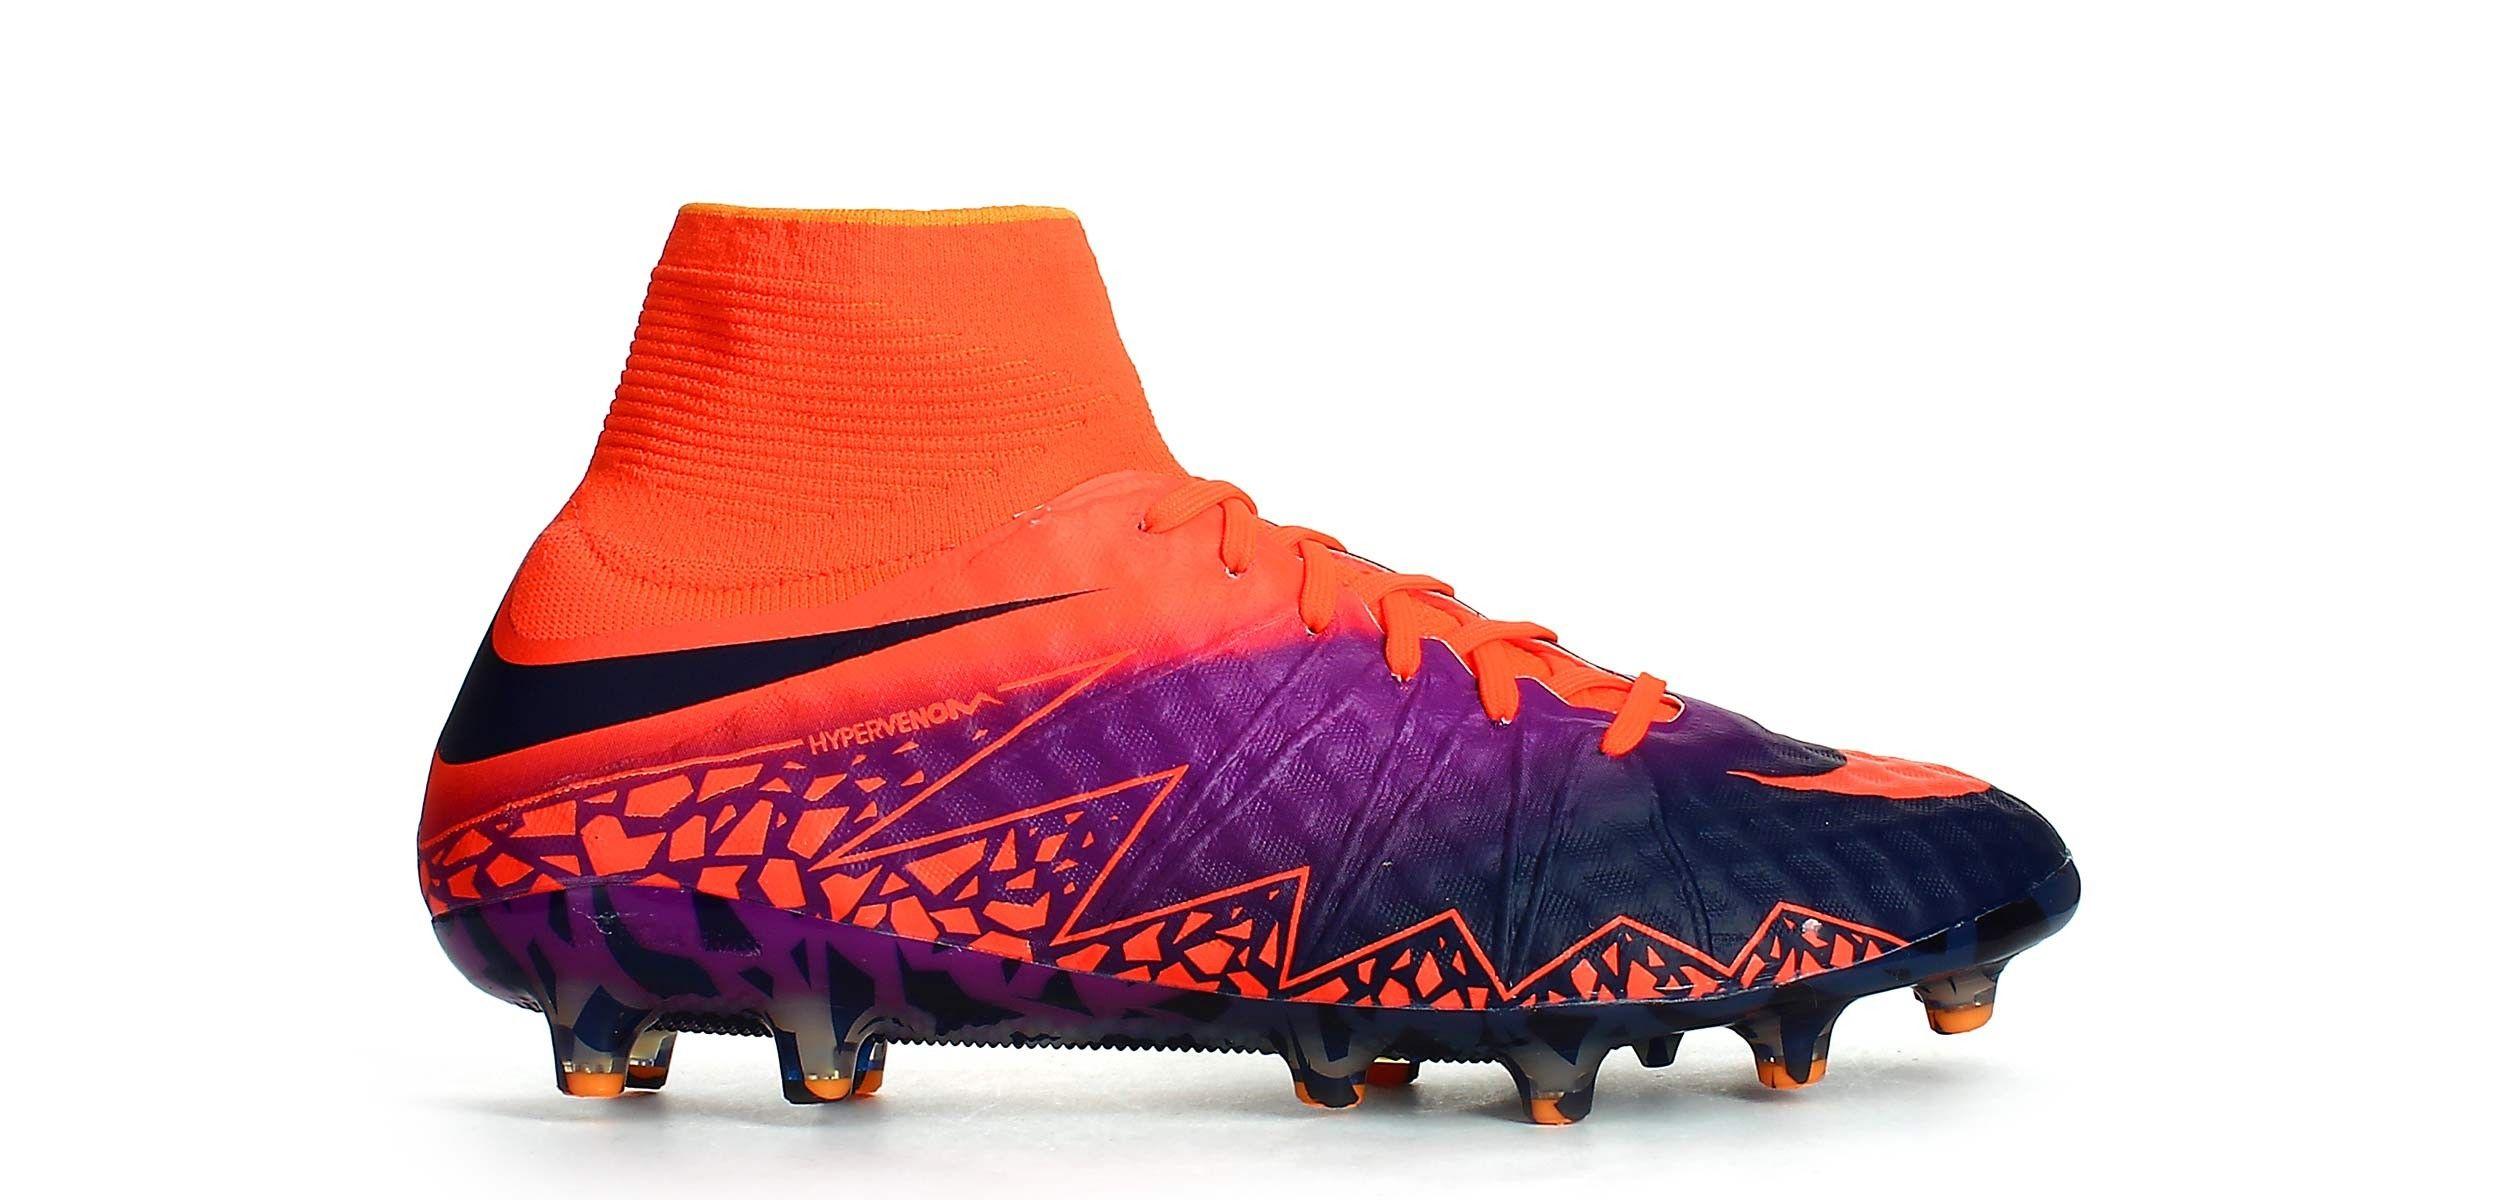 low priced b72e0 5eff6 Botas de fútbol Nike Hypervenom Phantom II AG-PRO - Rojo Carmesí   Púrpura  Vivid - Exterior pie derecho